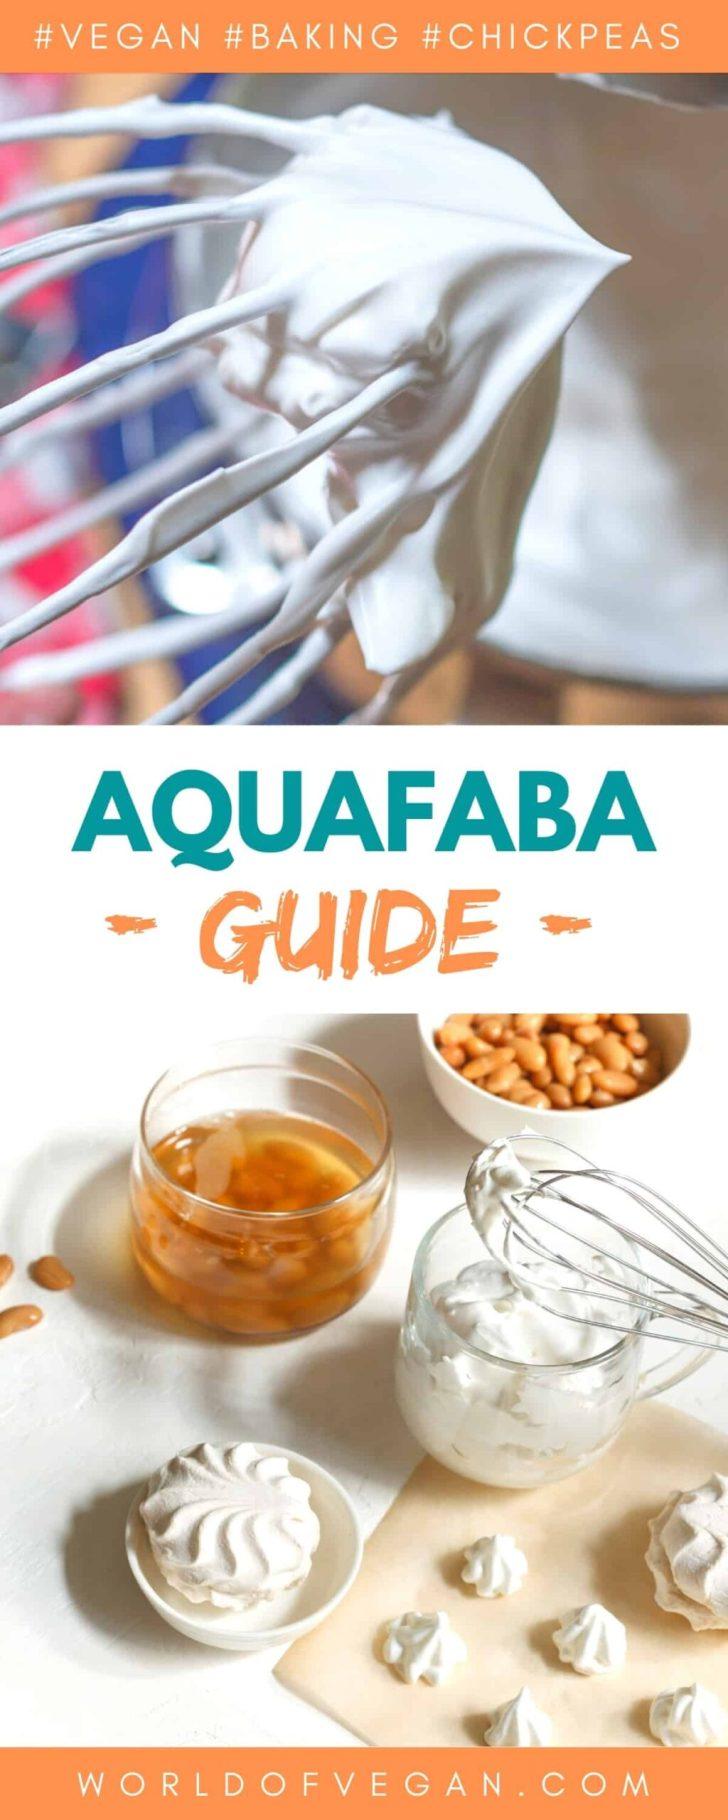 Guide to Vegan Baking With Aquafaba